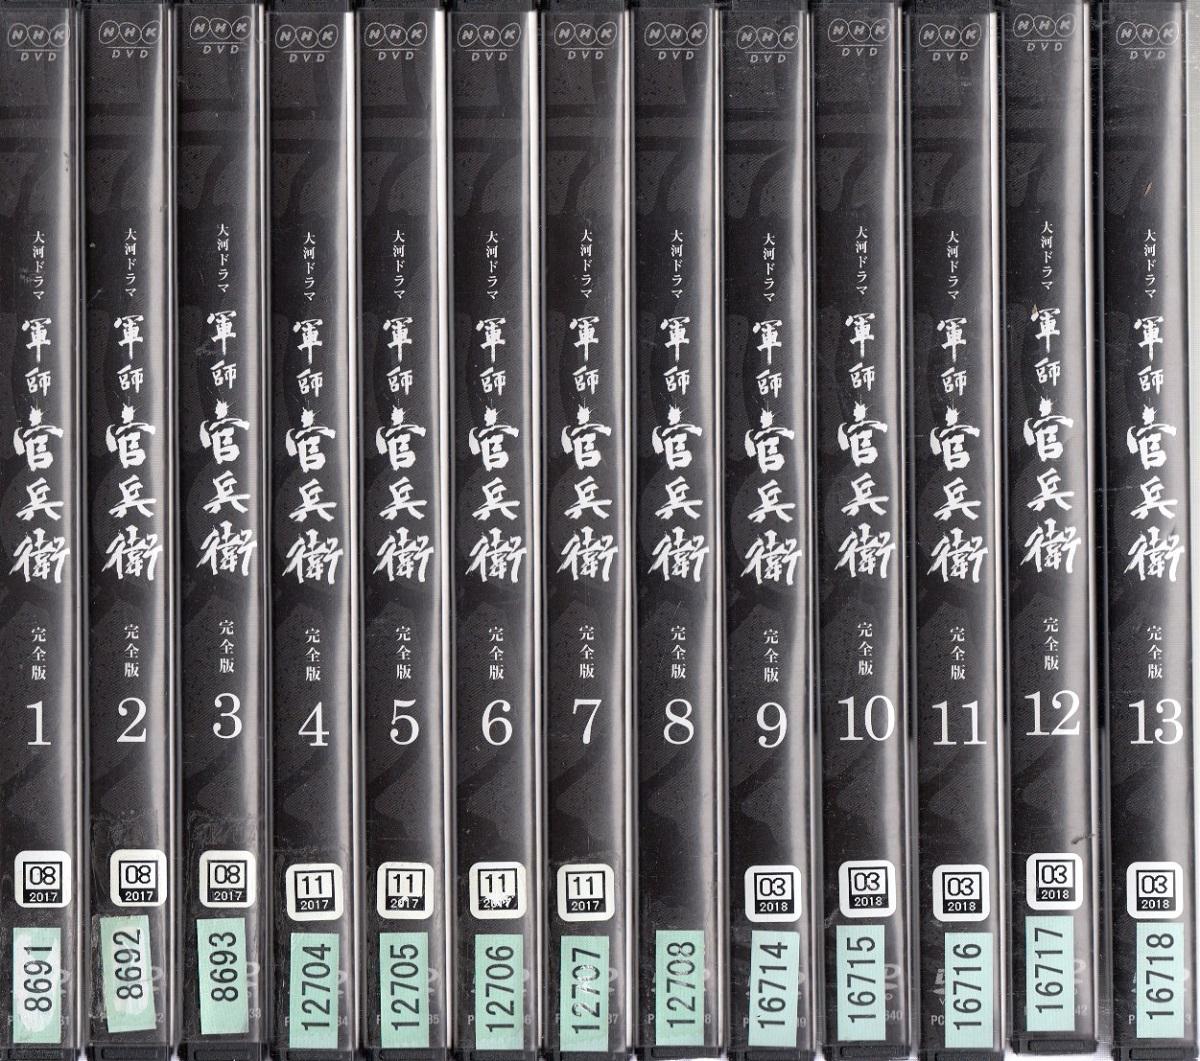 NHK大河ドラマ 軍師官兵衛 完全版 全13巻セット【中古DVD/レンタル落ち/送料無料】